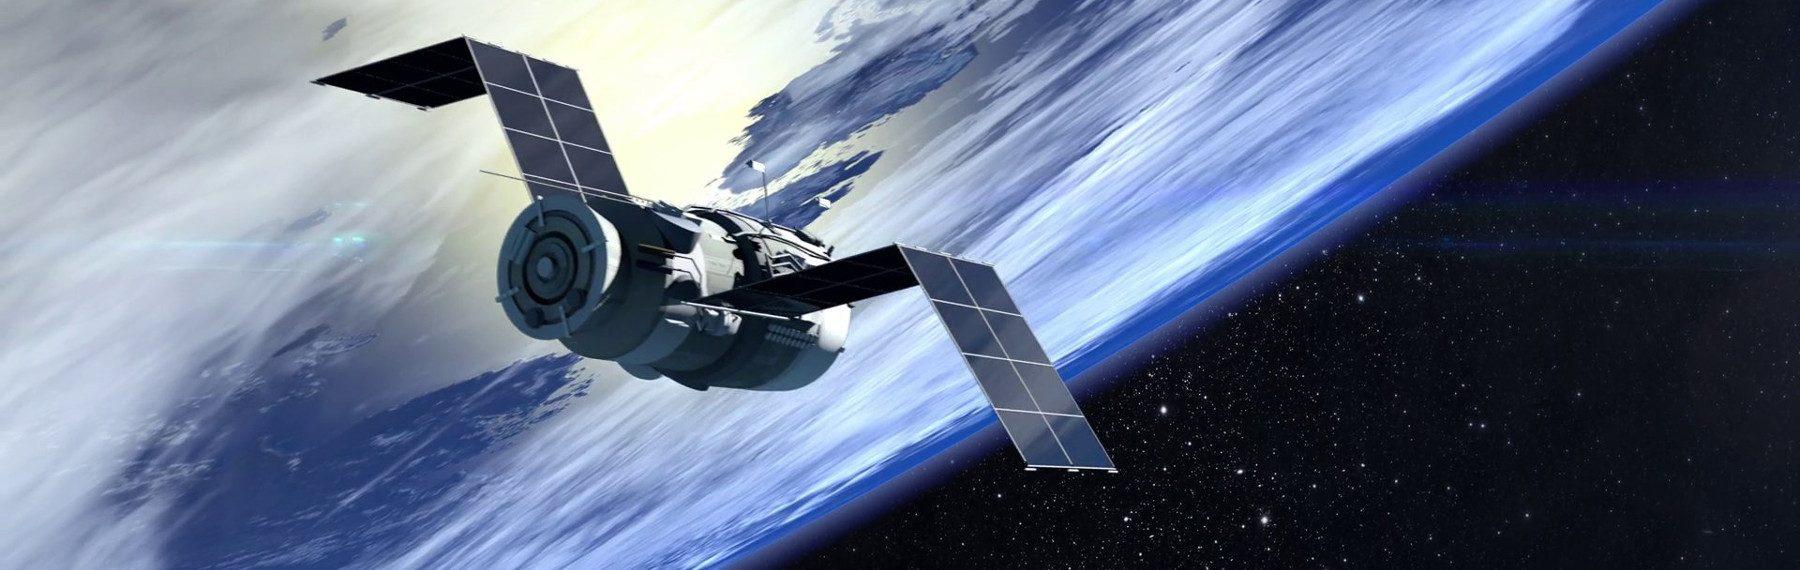 201810espacial 1 1800x570 - Aeronautical, Space and Defence